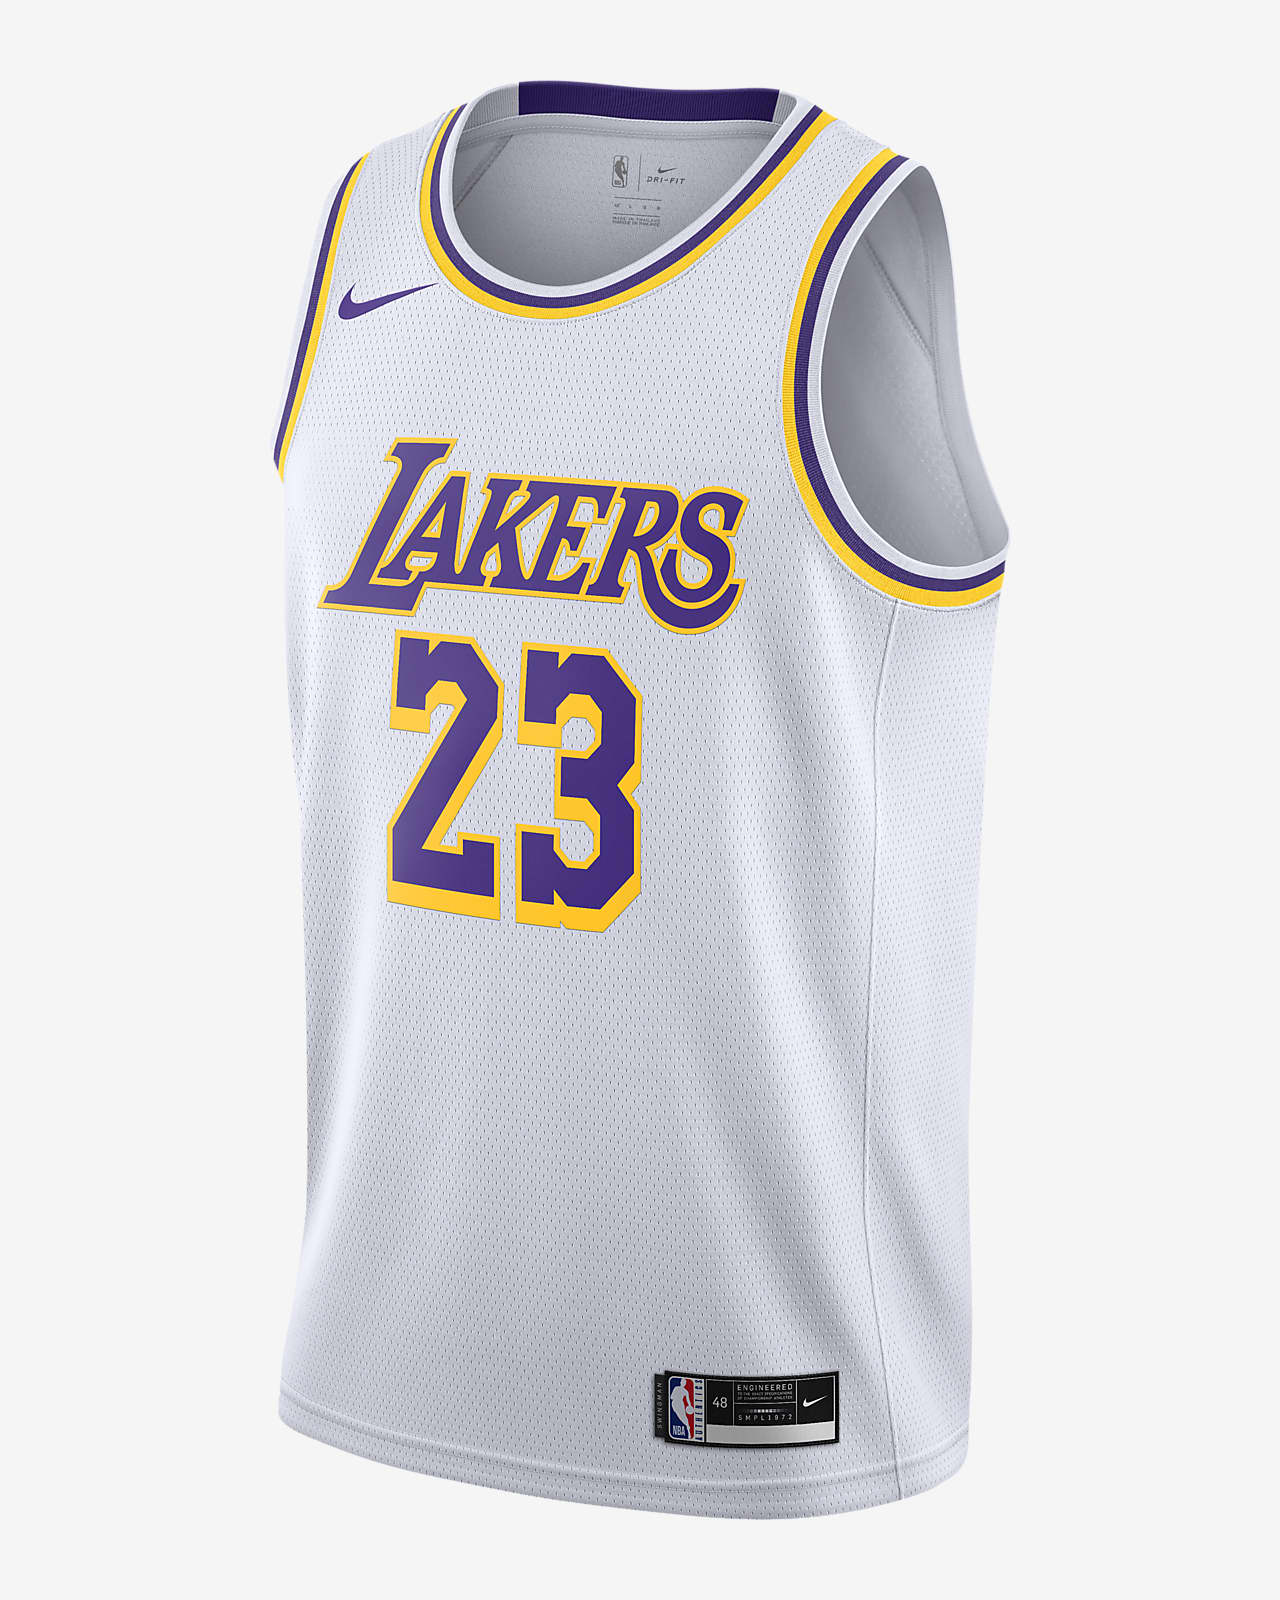 Maillot Nike NBA Swingman LeBron James Lakers Association Edition 2020